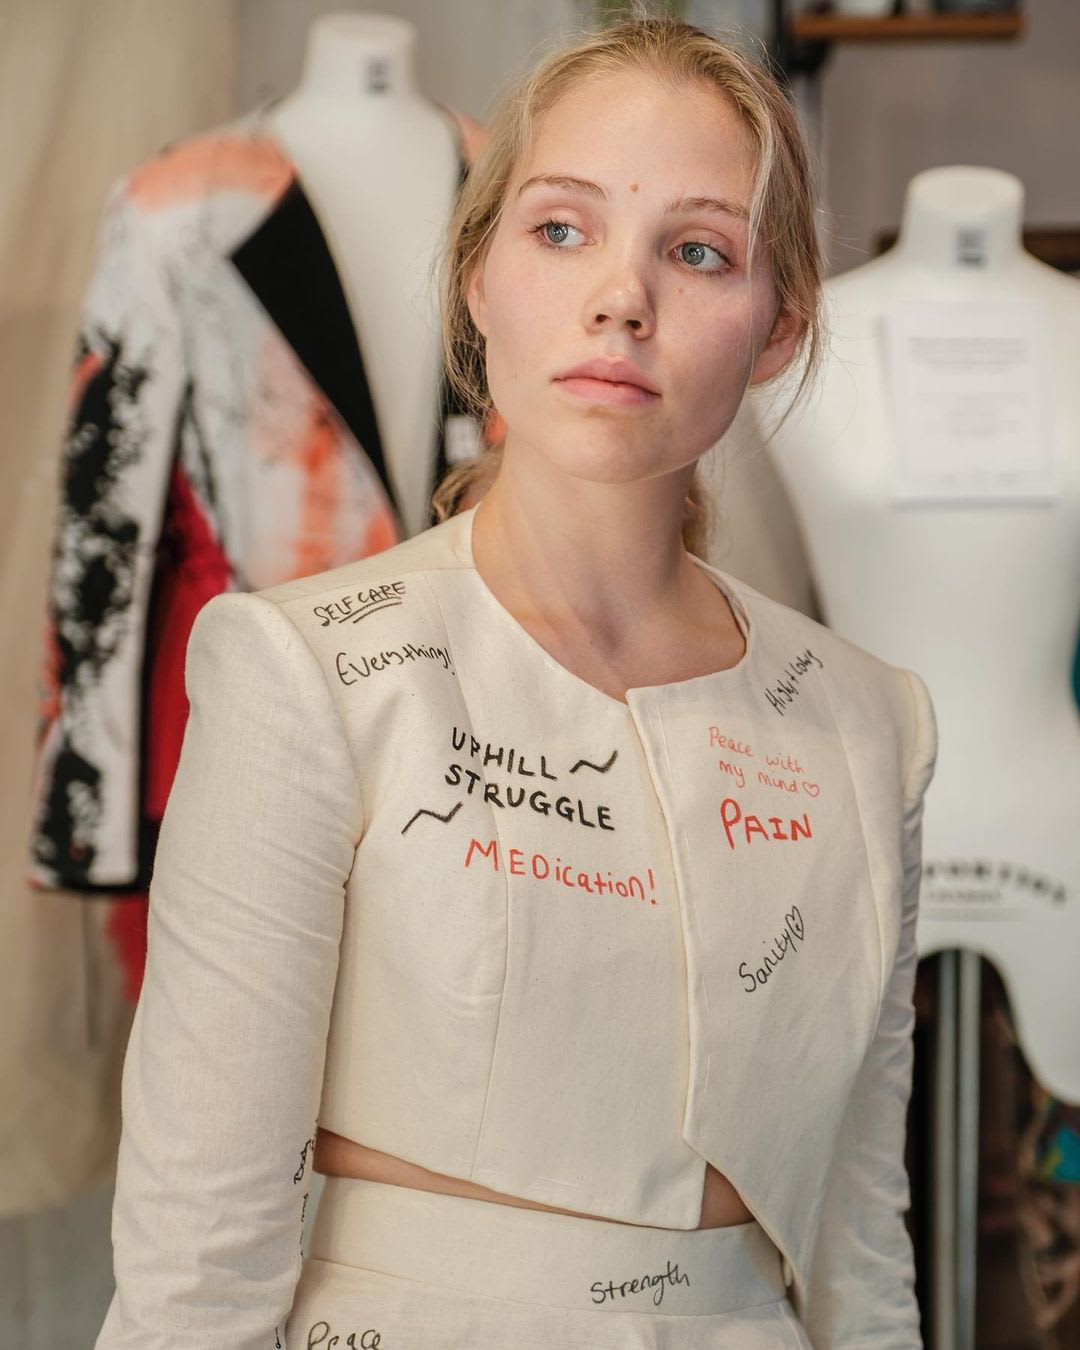 Sarah-Hollebon-2020-Photographer-Aidan-Cusack-Model-Antonia-Latz.jpg